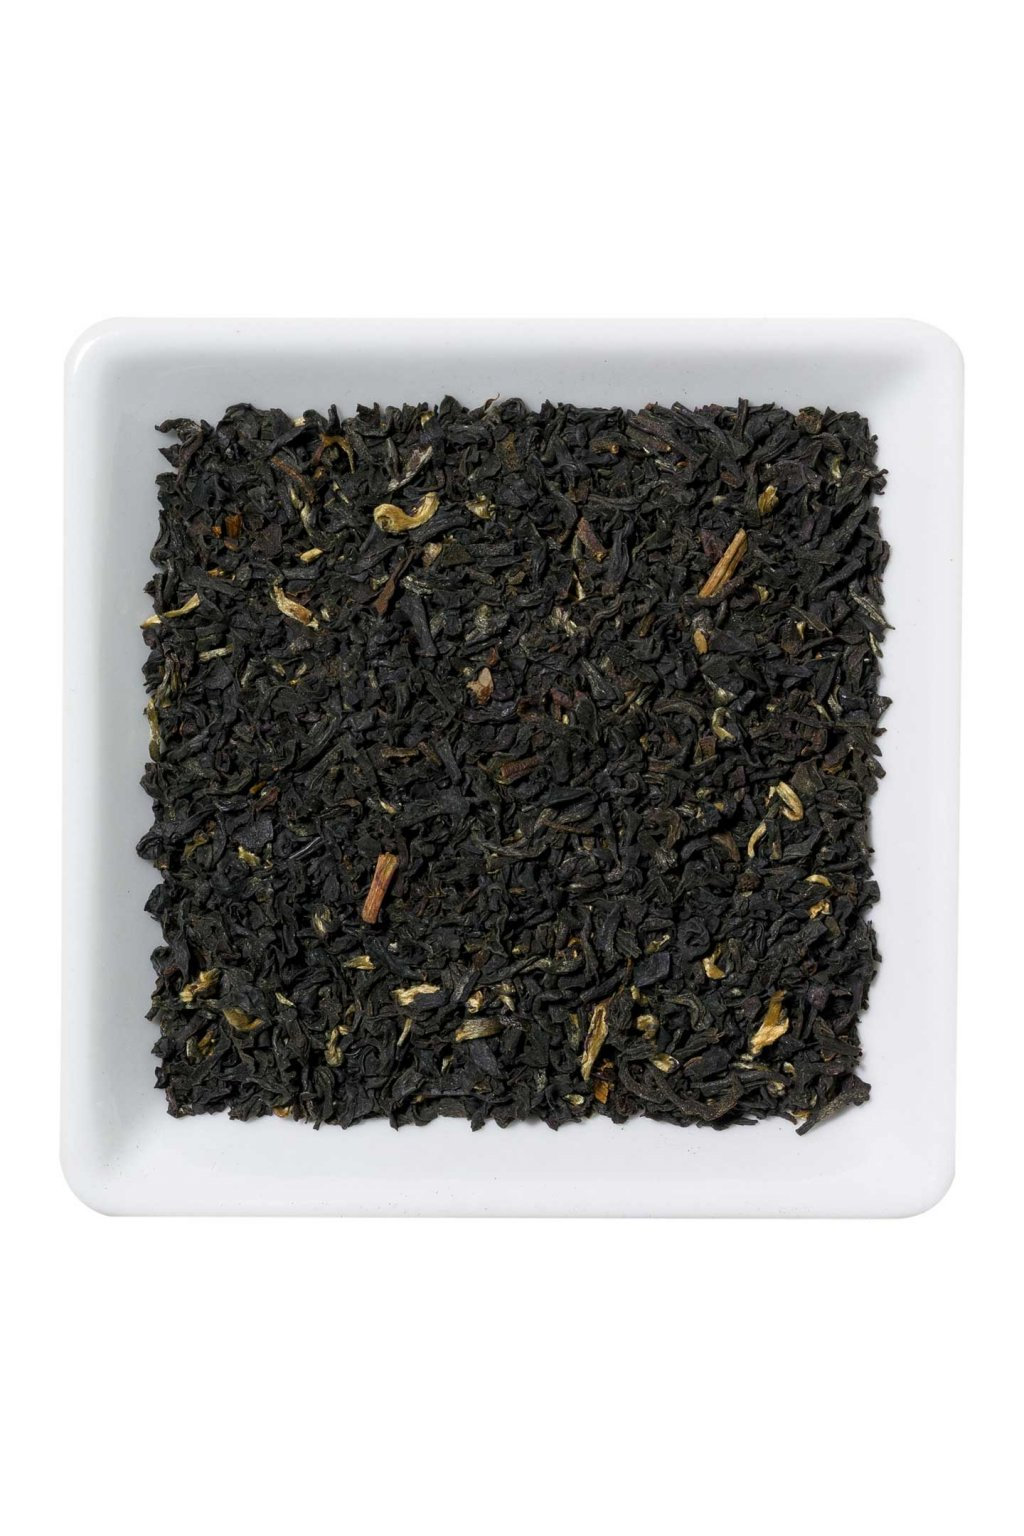 00122 Assam GFBOP Hathikuli Organic Tea